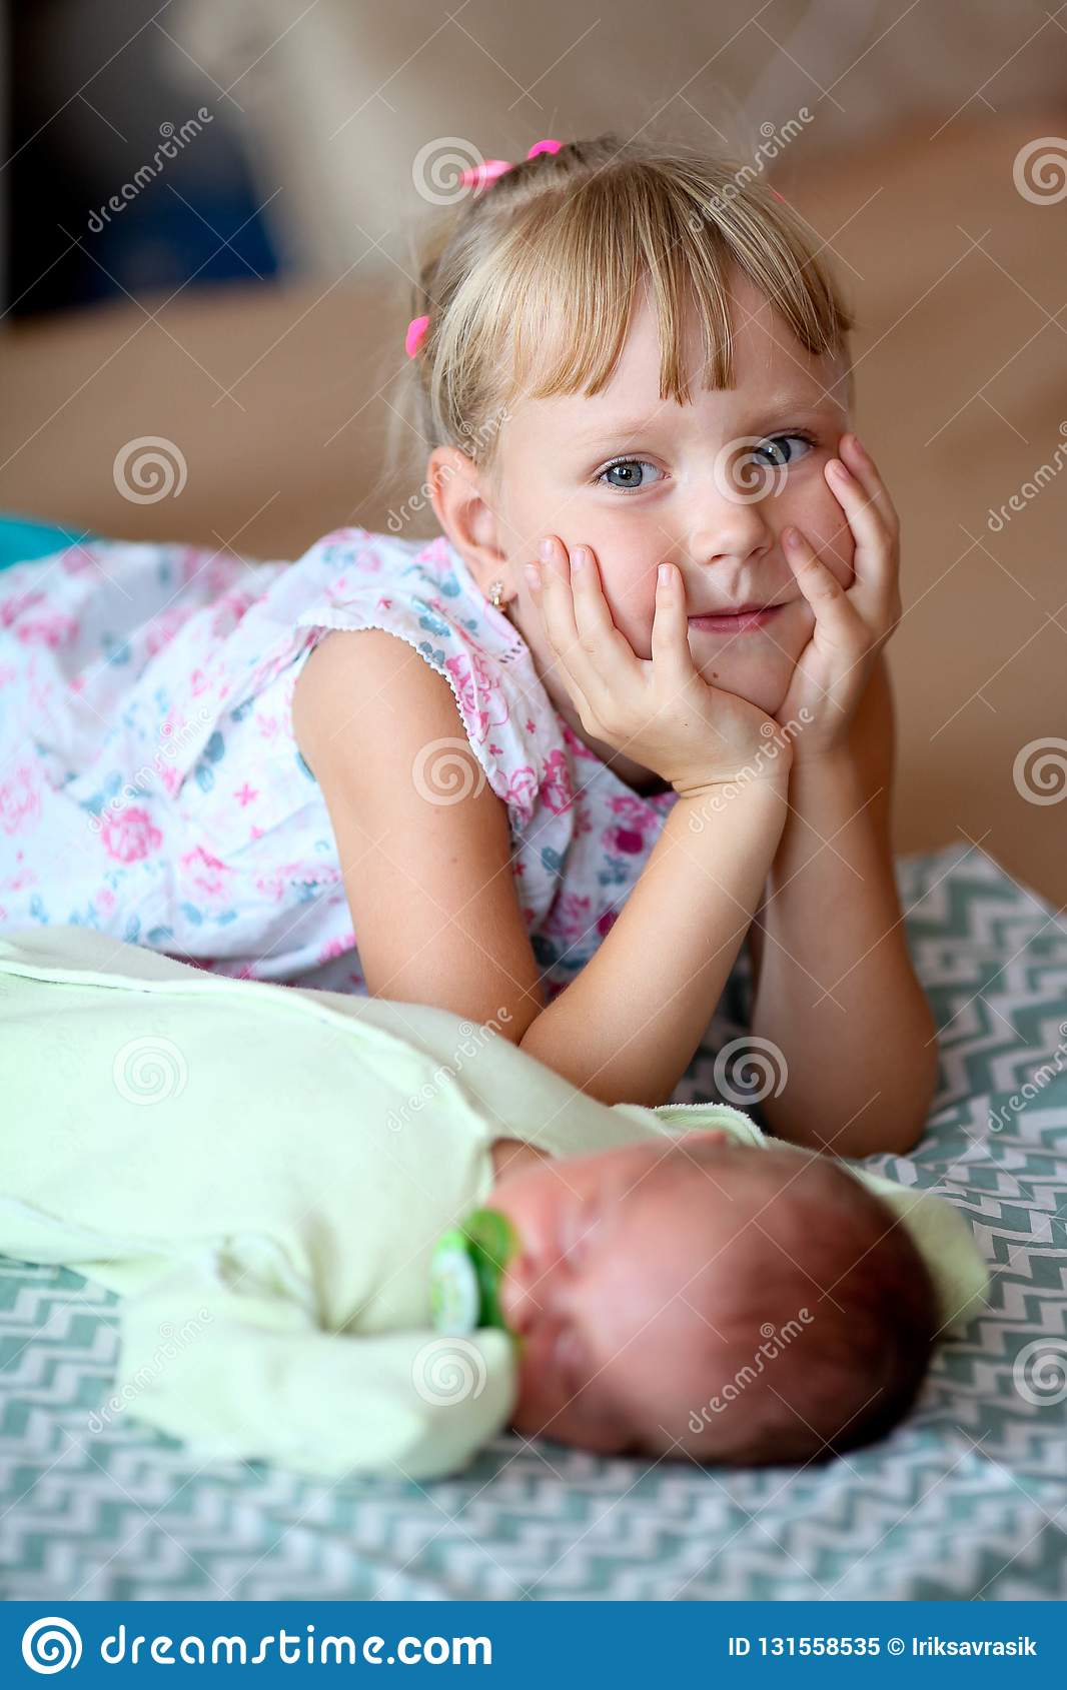 Little Sister Hugging Her Newborn Brother Toddler Kid